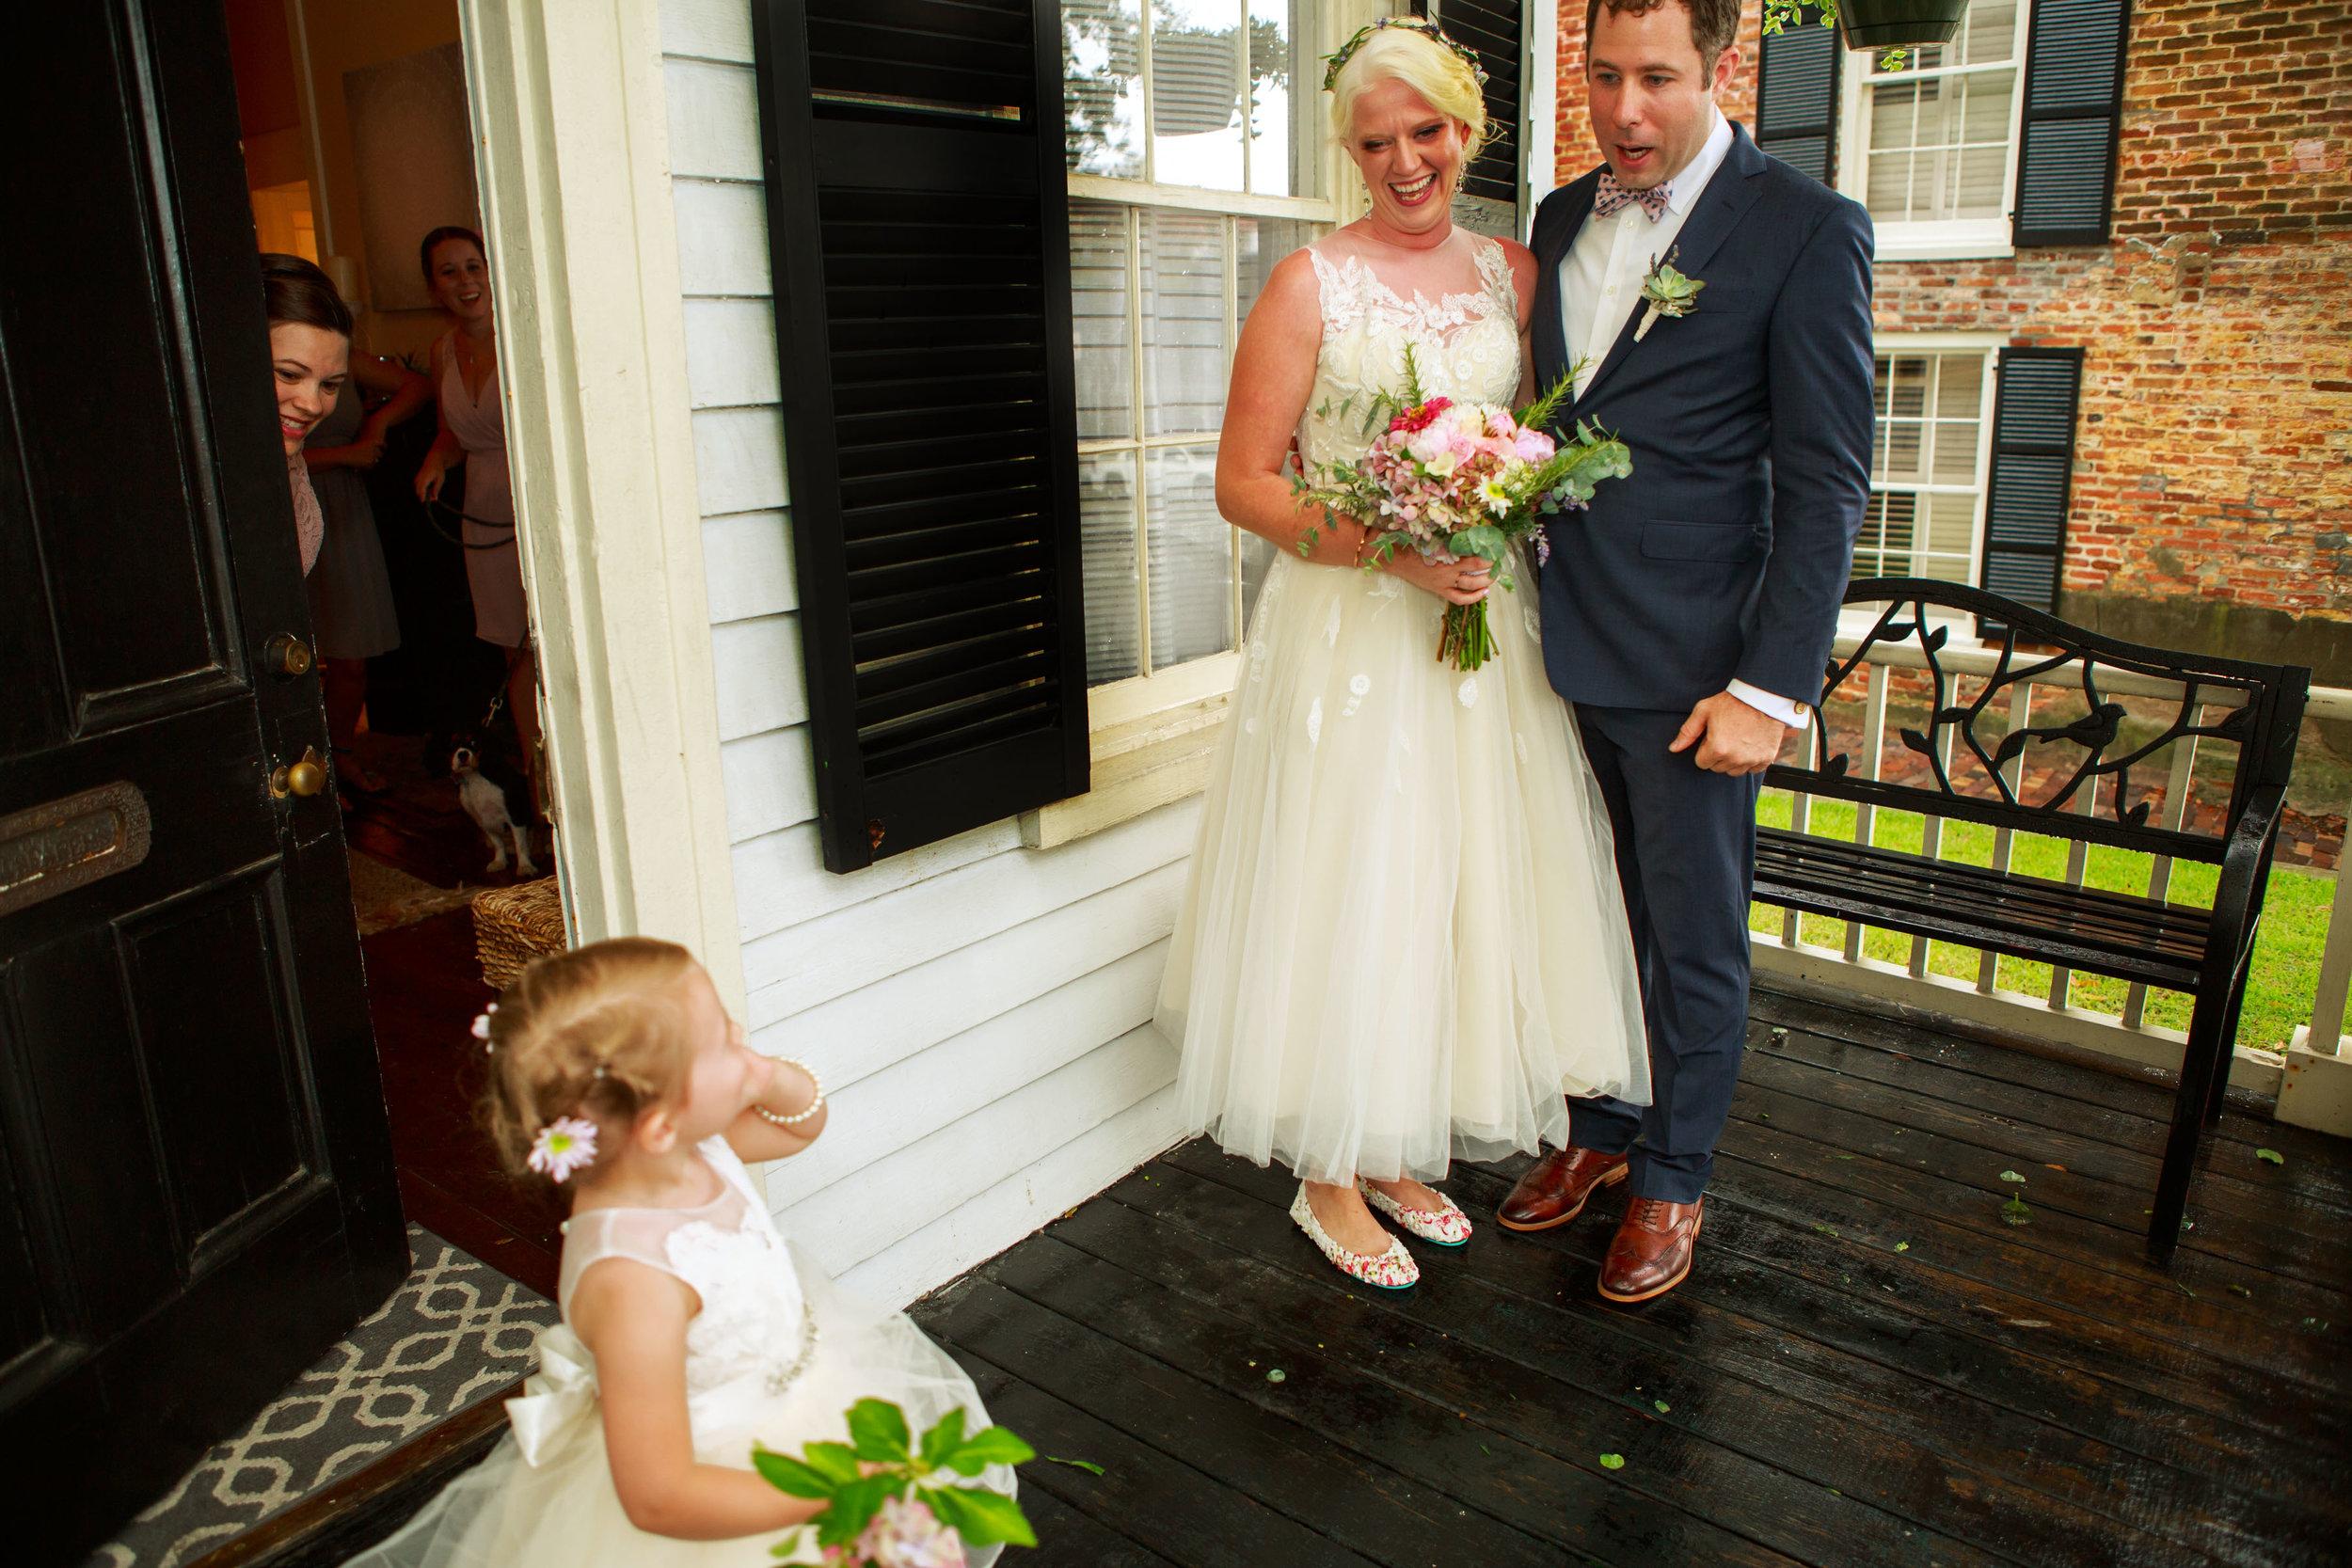 128-South-Wedding-Tiffany-Abruzzo-Photography-First-Look-11.jpg